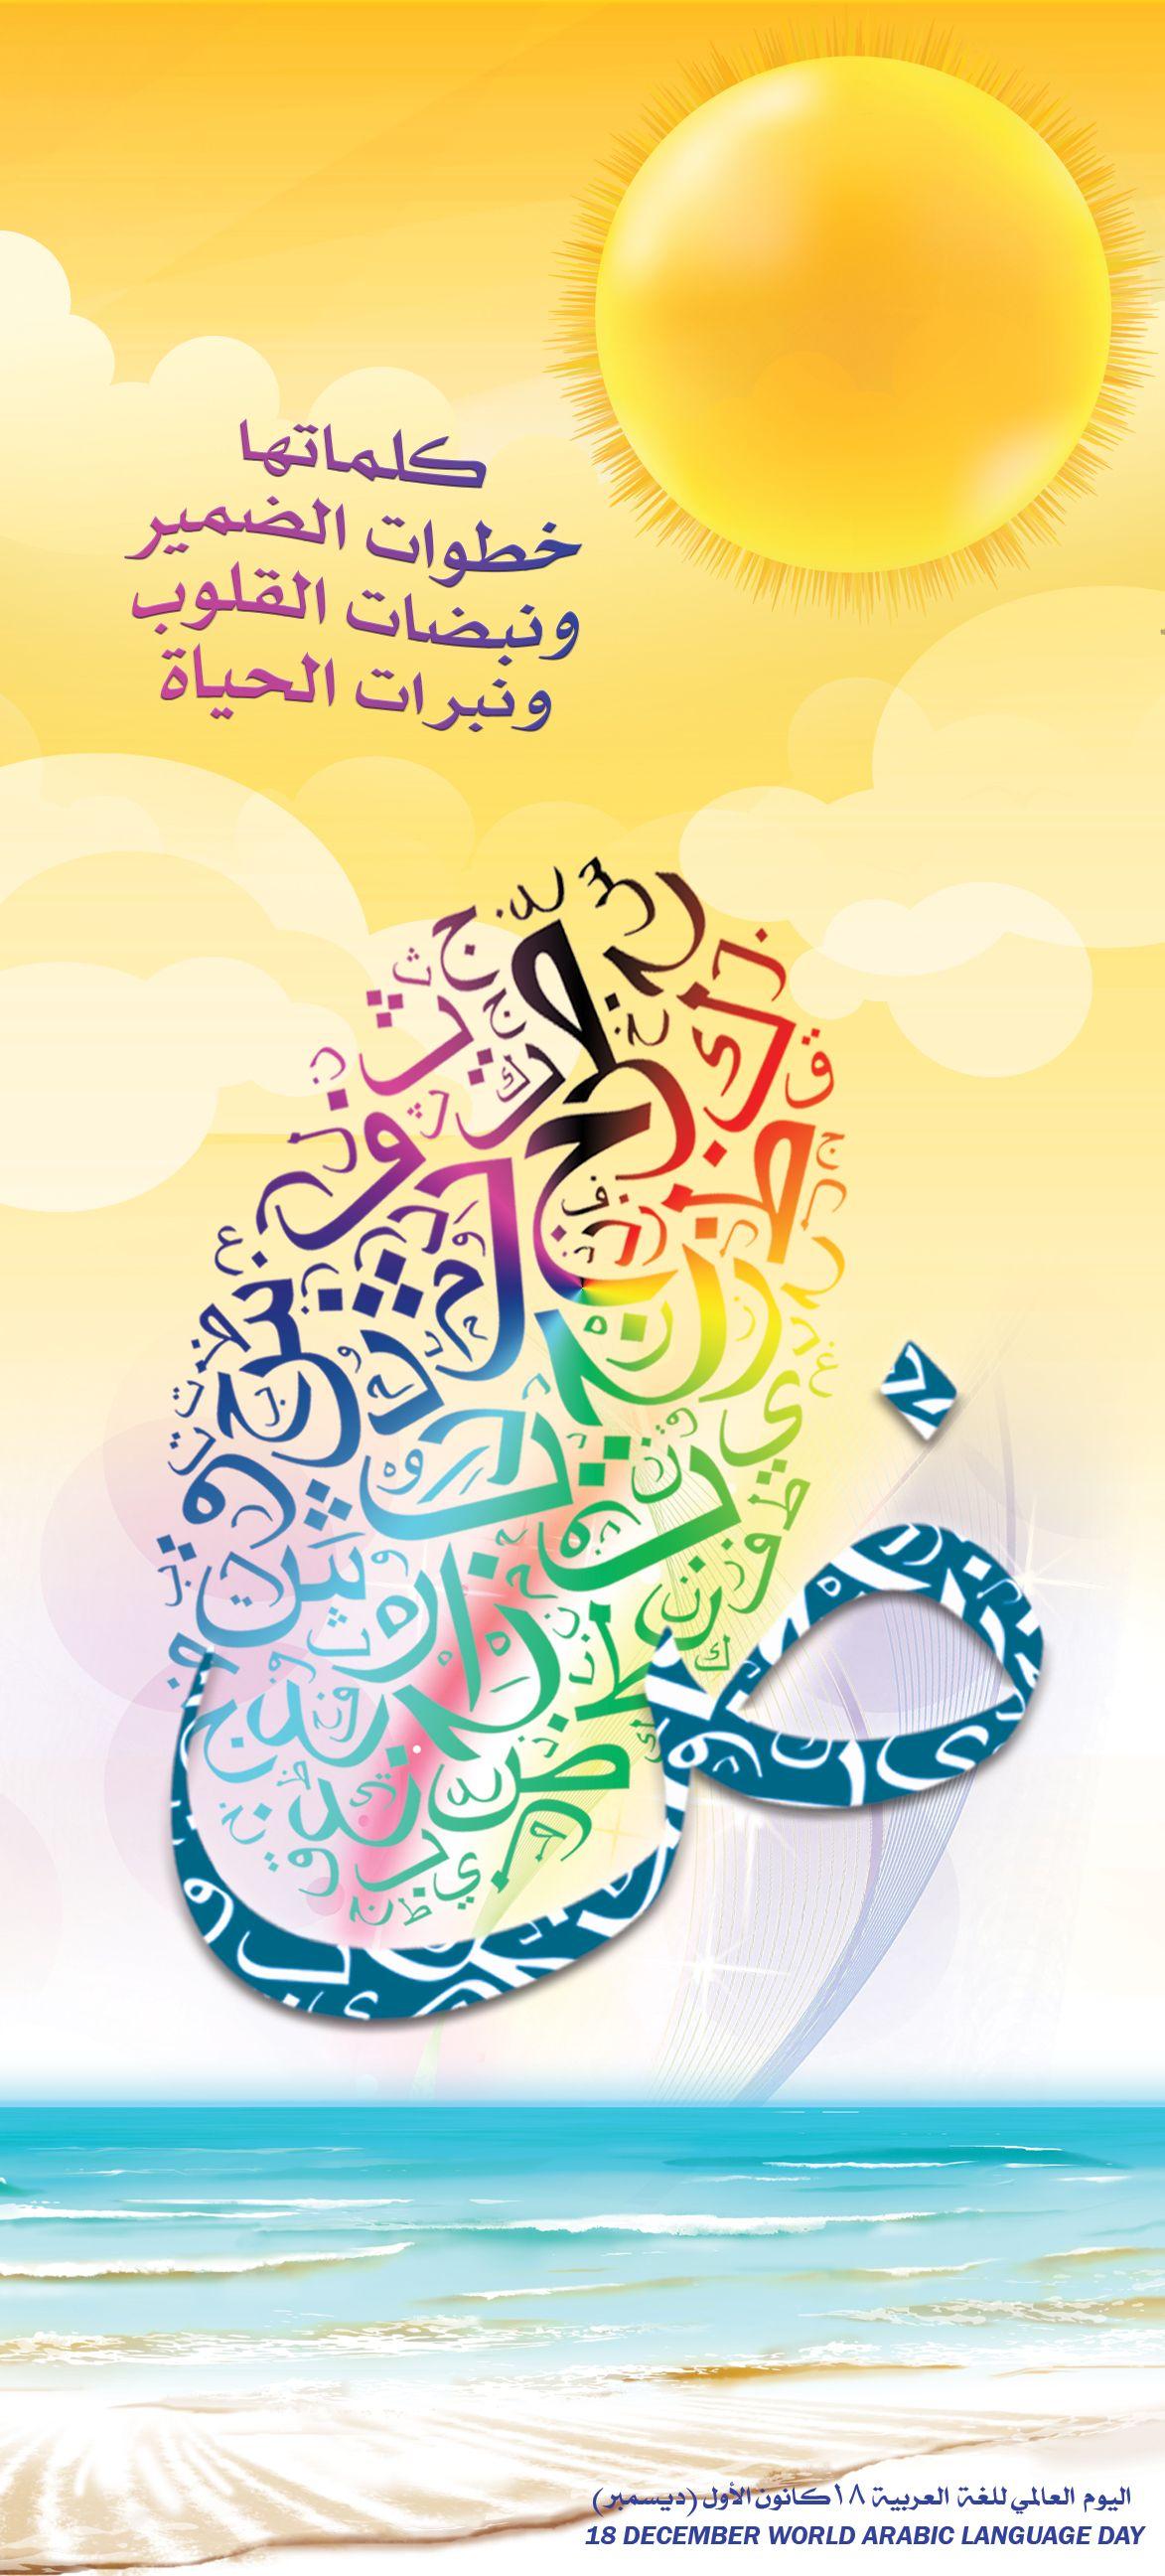 جمال اللغة العربية The Beauty Of Arabic Language Arabic Language Medical Sales Rep Medical Sales